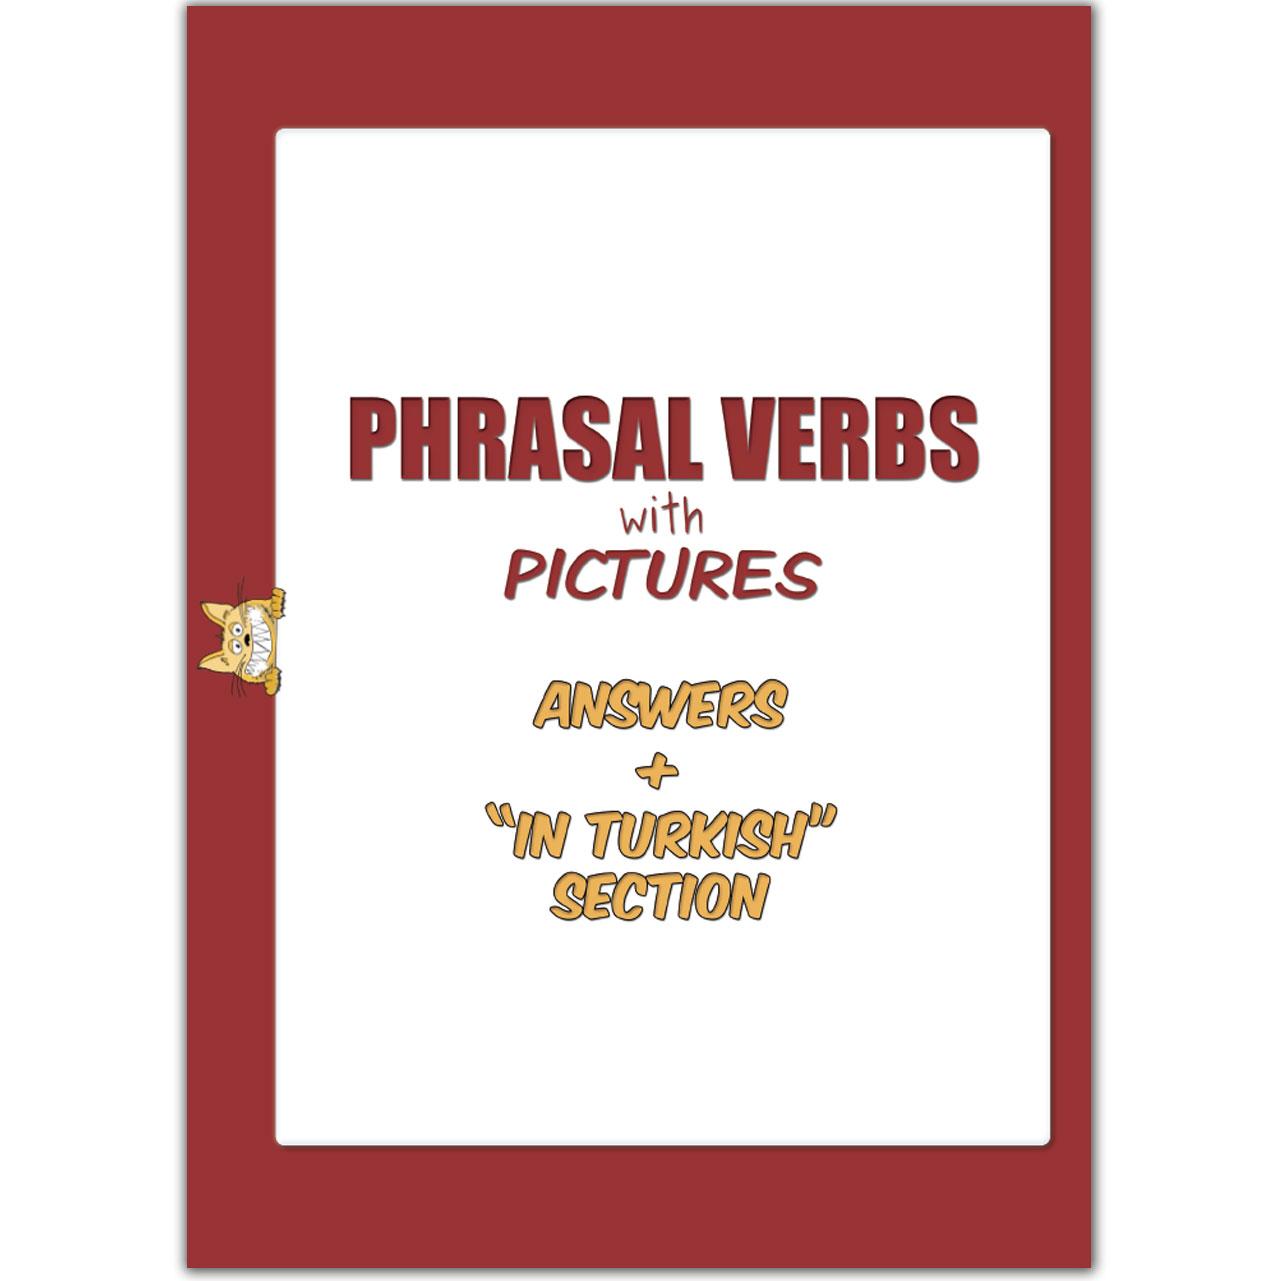 Phrasal Verbs With Pictures Ozer Kiraz Kitaplar